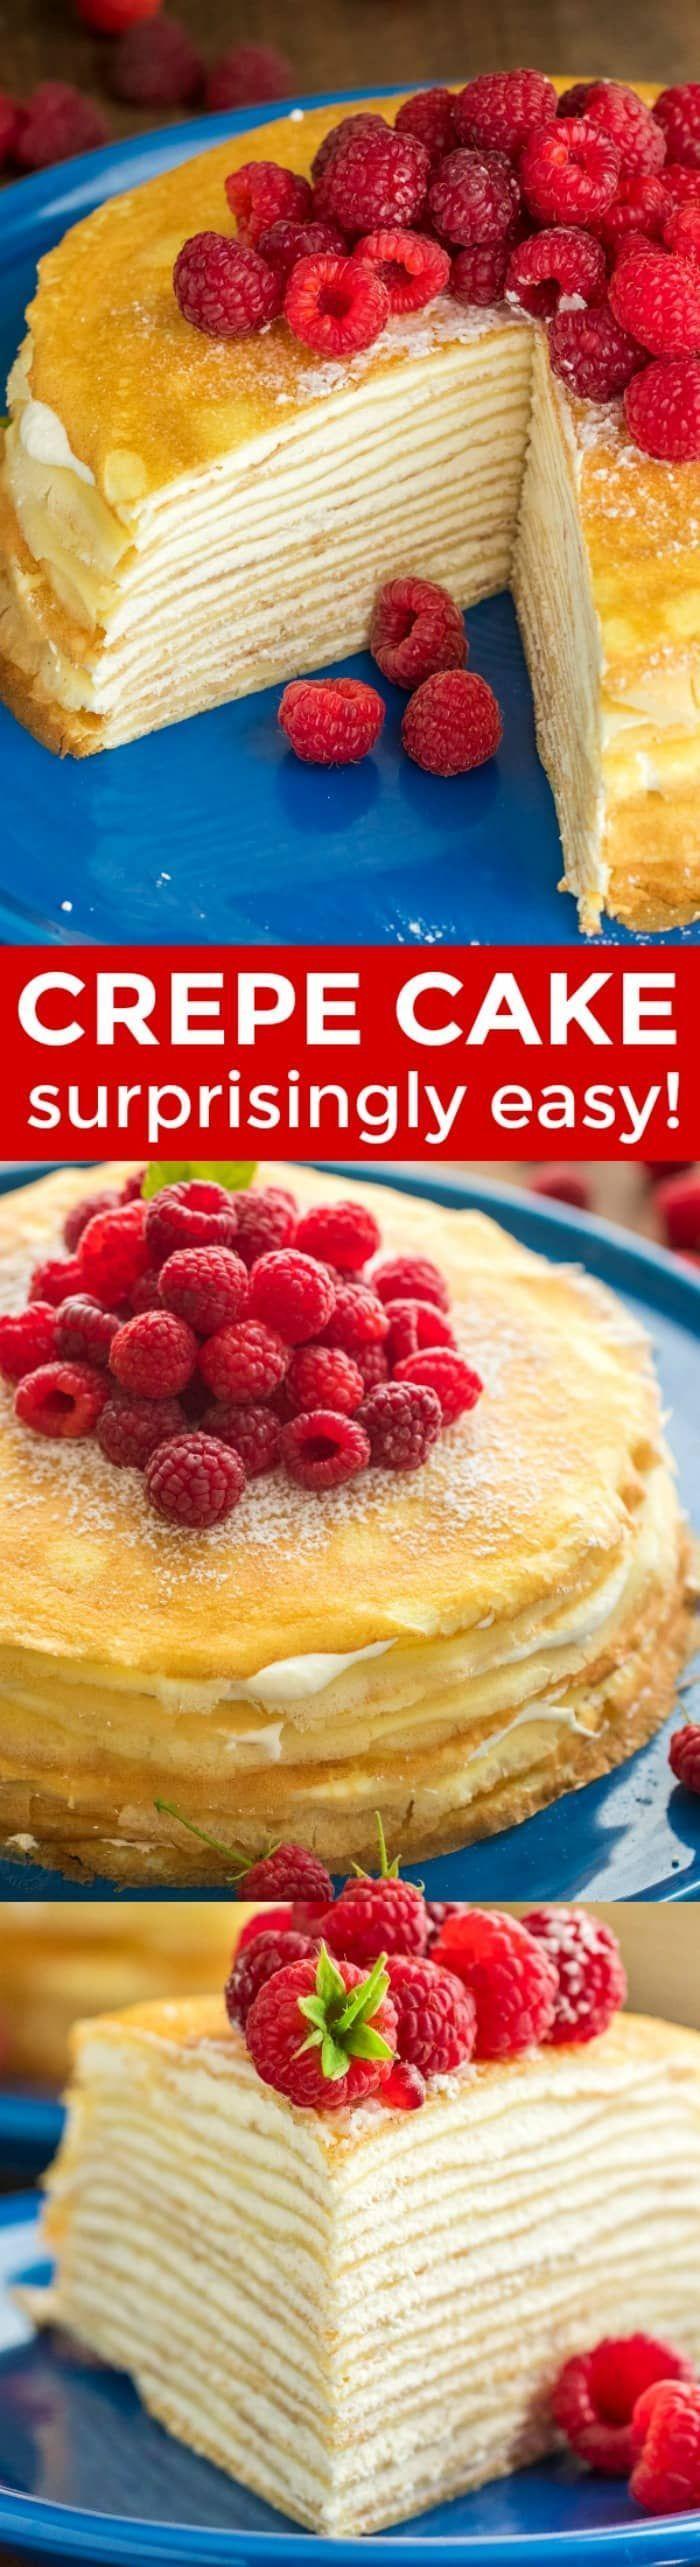 Easy Crepe Cake recipe